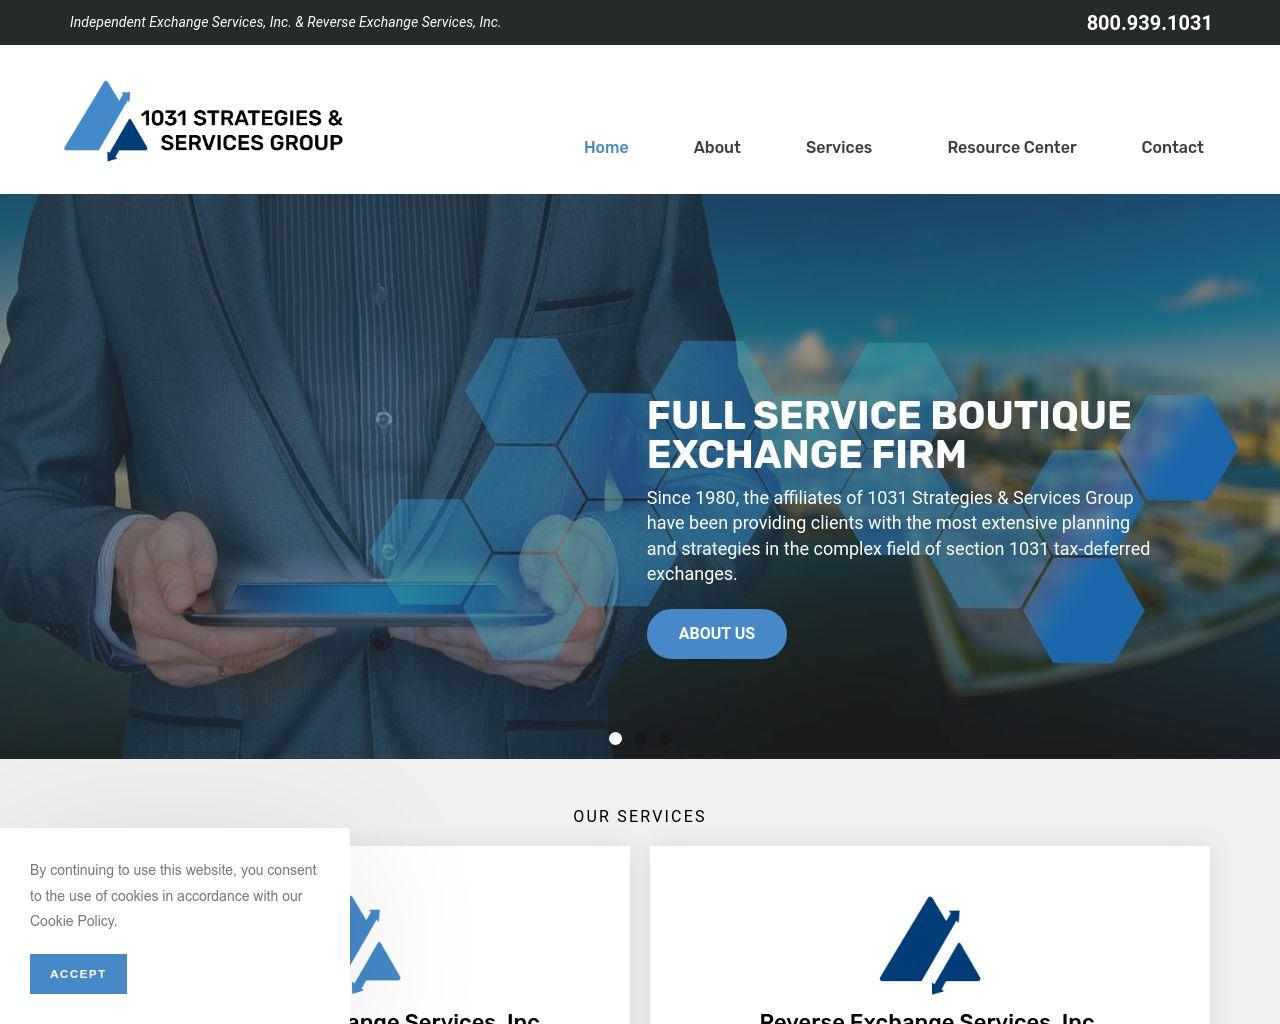 Independent Exchange Services Inc Diamond Certified